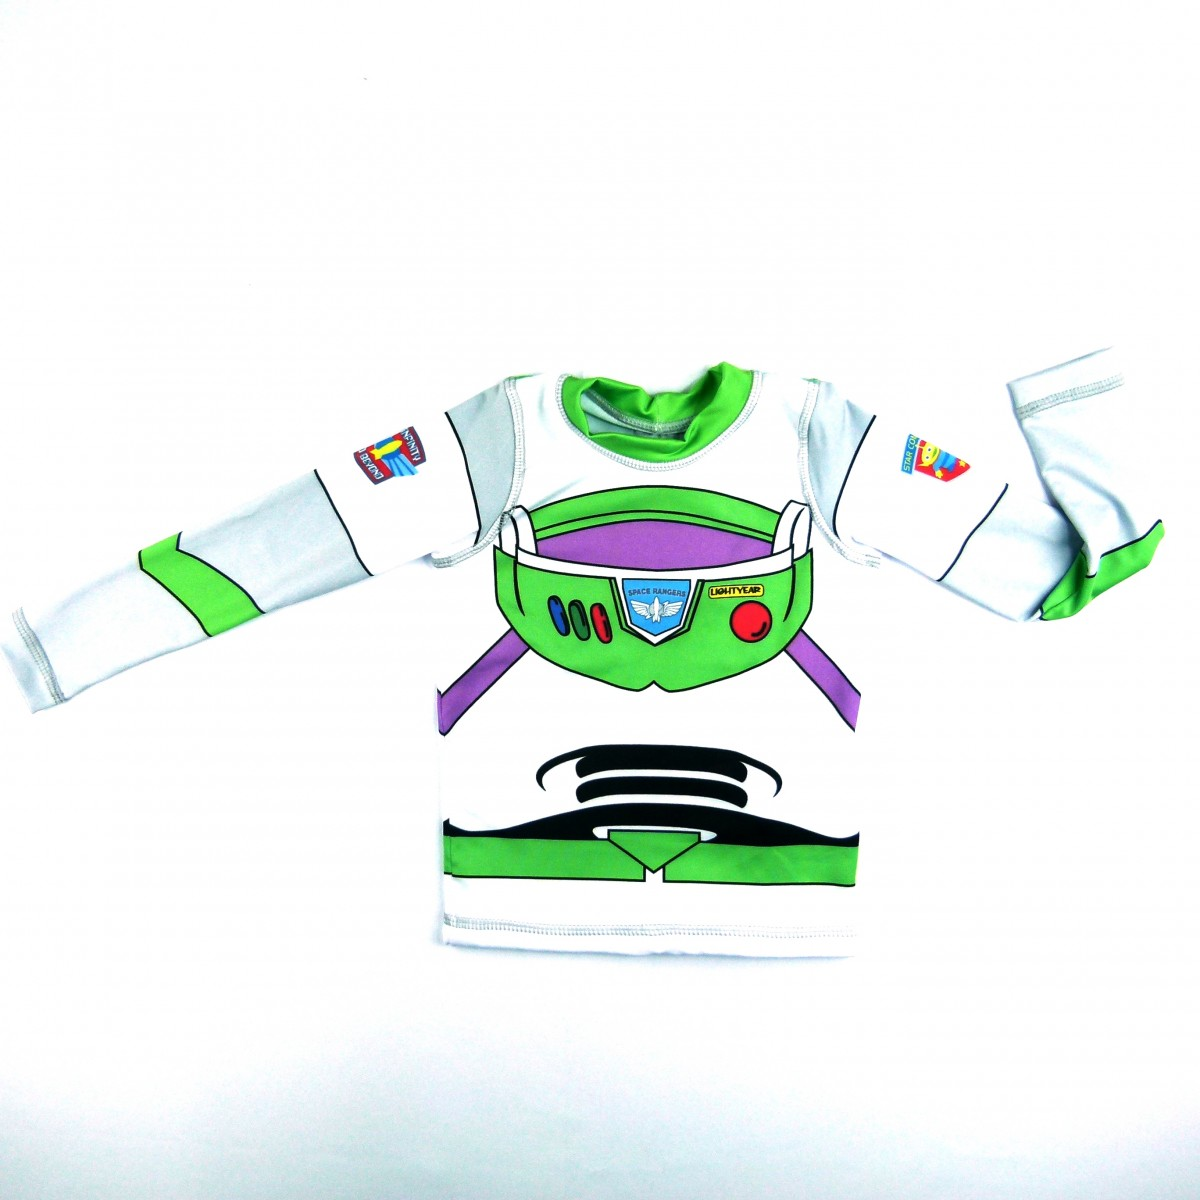 Camiseta Acqua Buzz Manga Longa 50 Fpu Uv. line - 034983 Branco